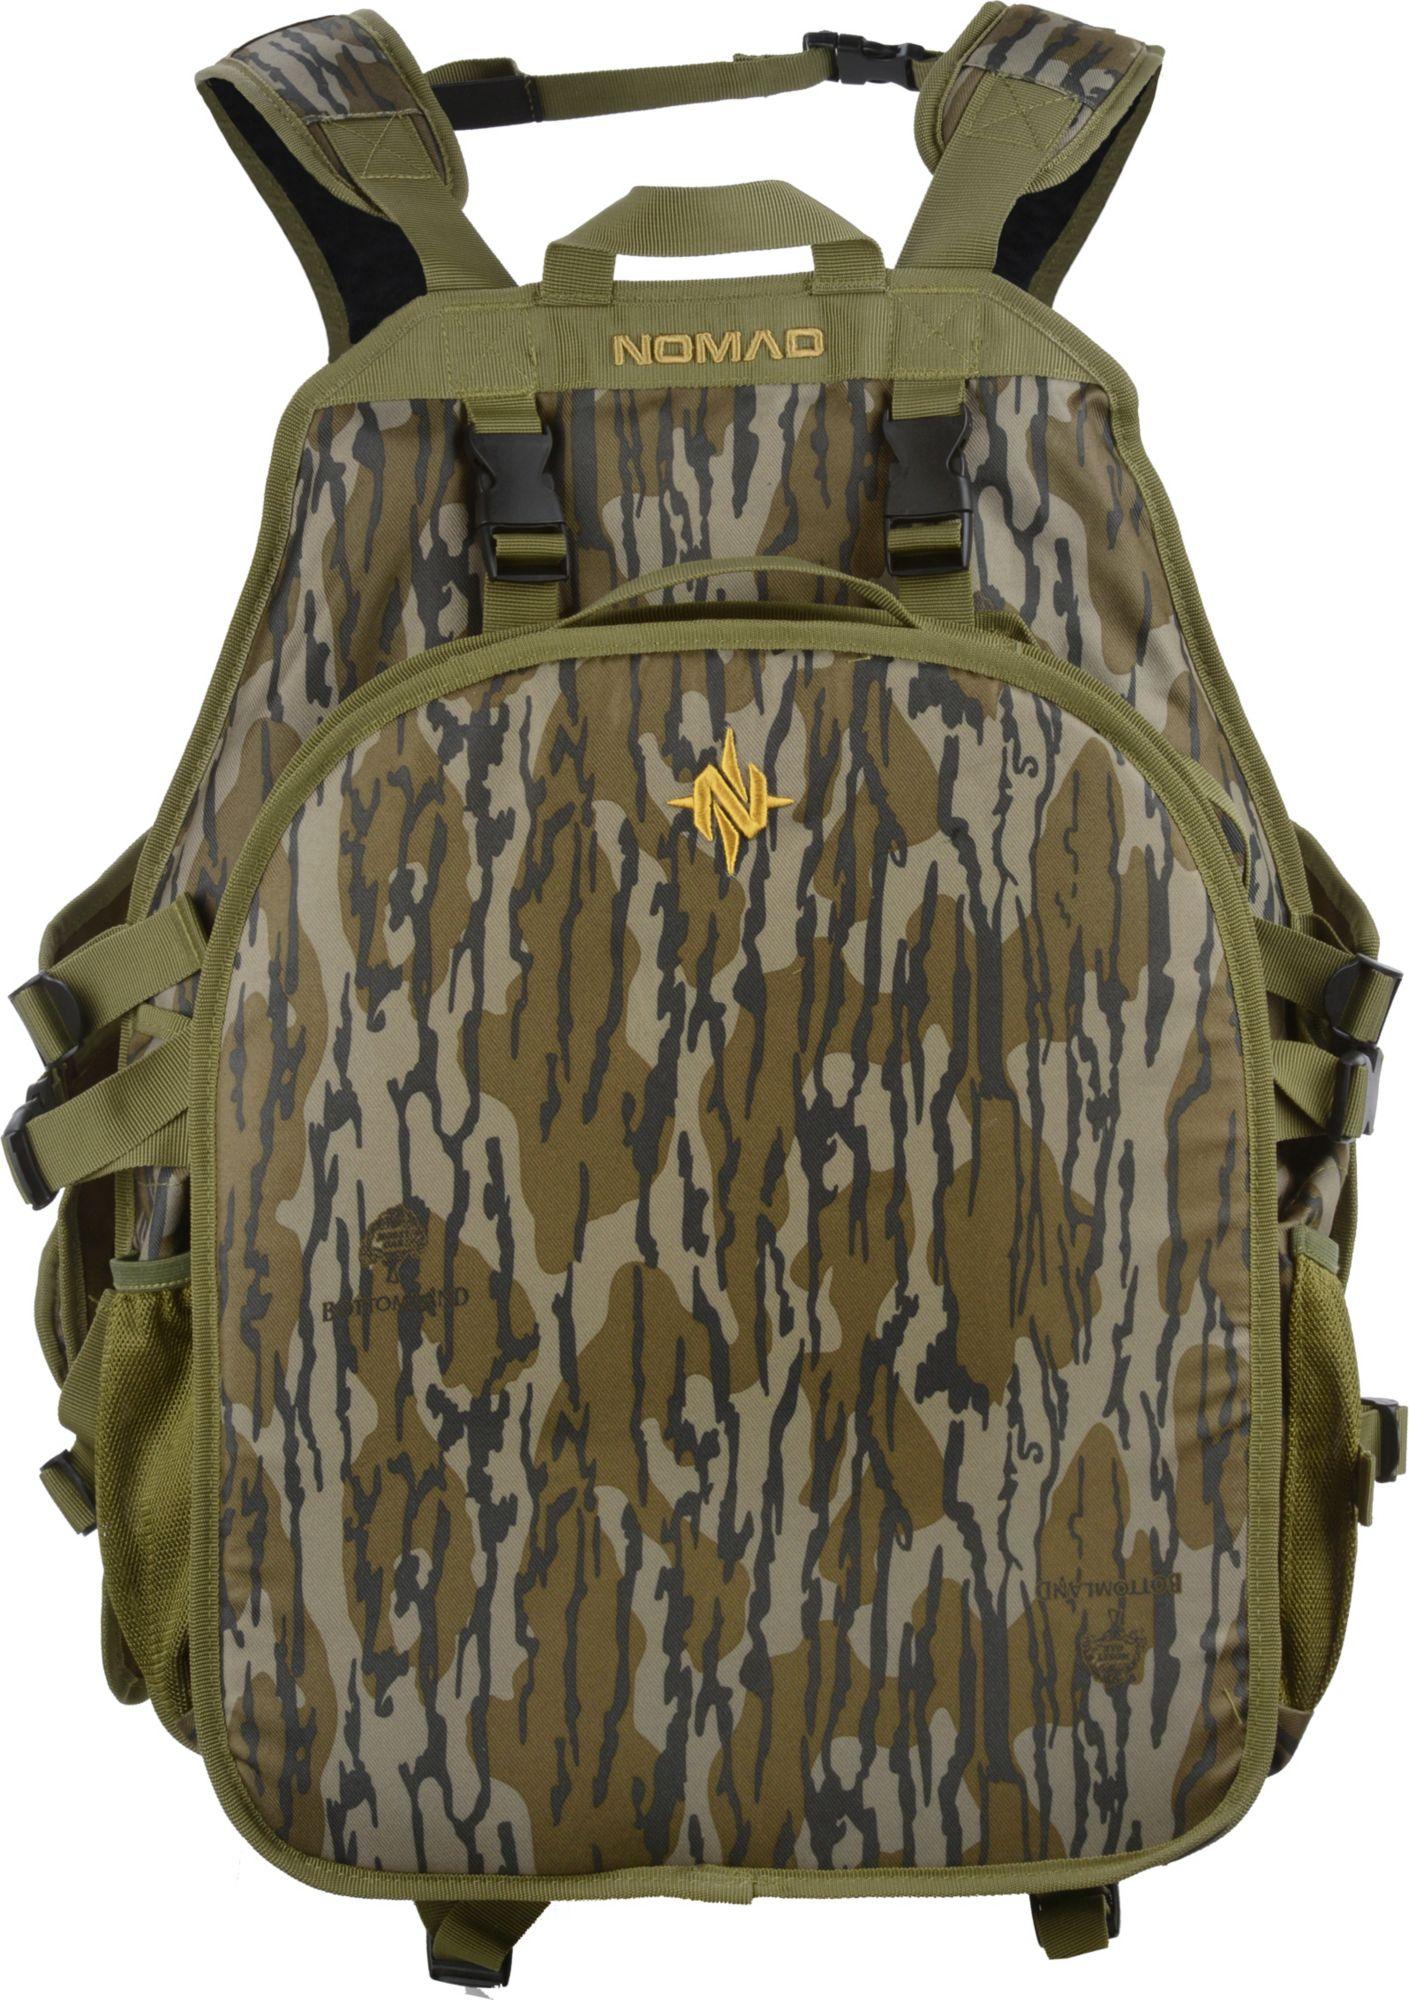 Nomad Turkey Hunting Vest, Men's, Brown thumbnail